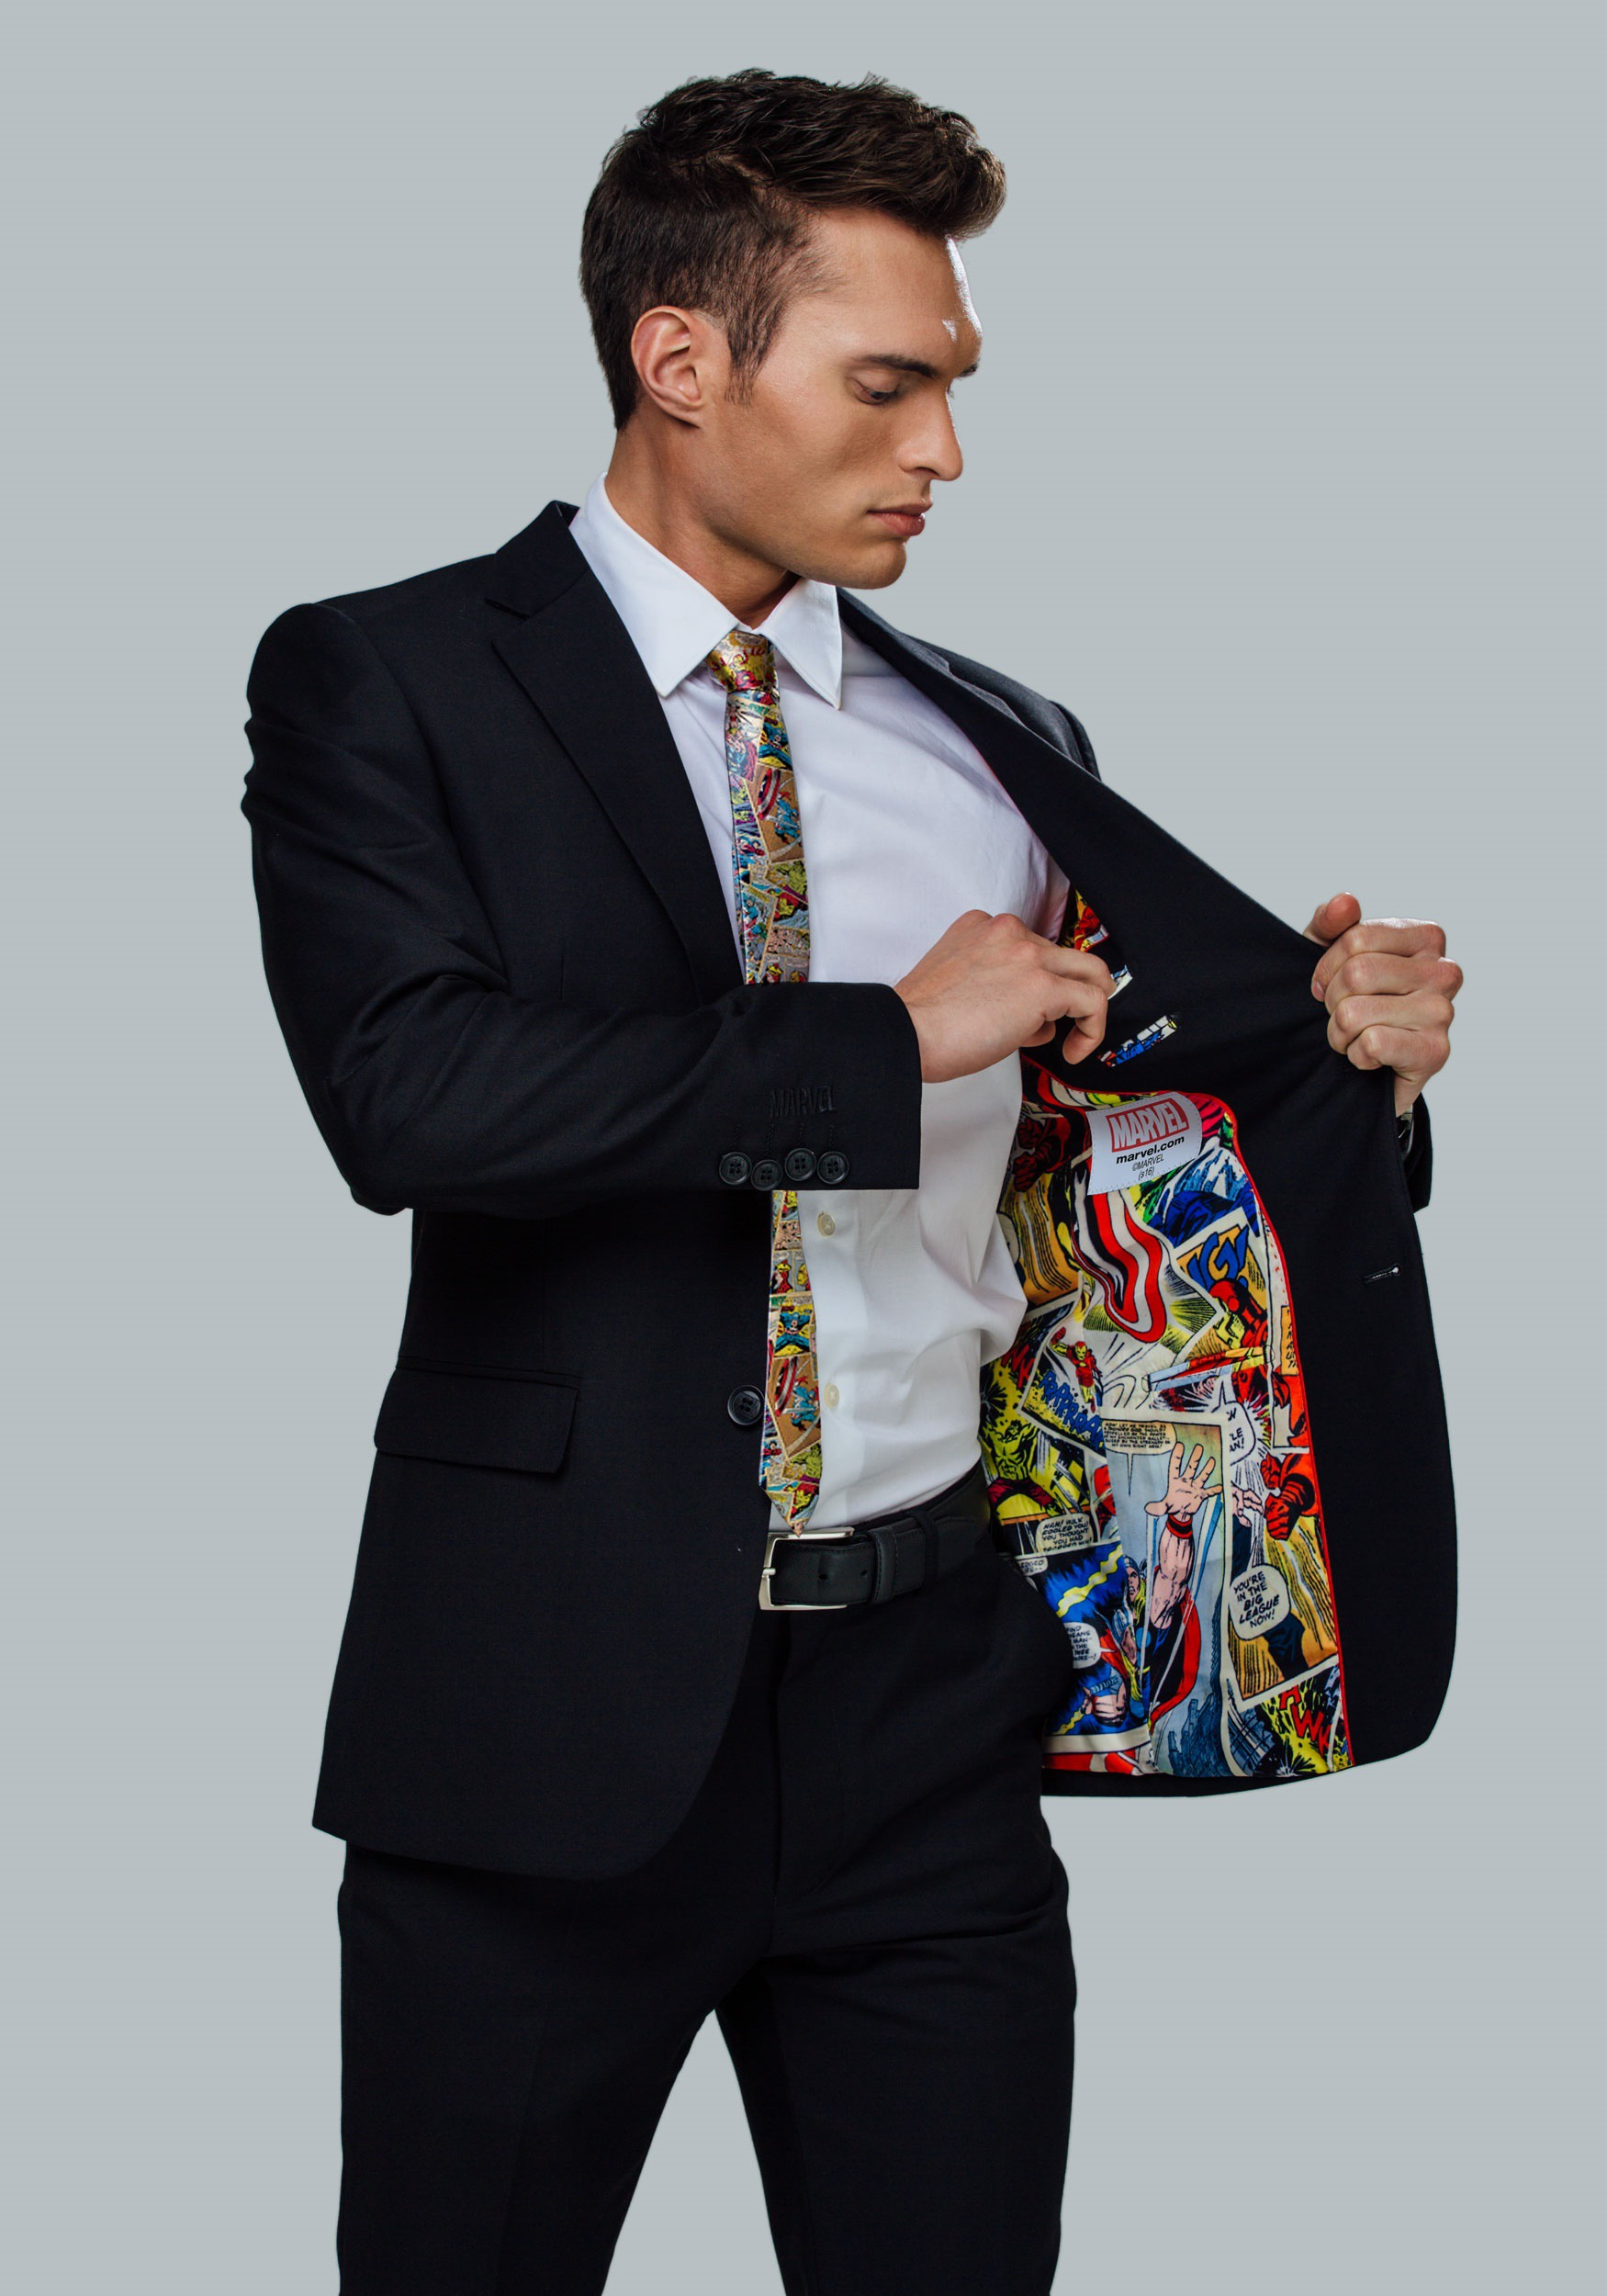 bb8222cf950 Secret Identity Marvel Comic Strip Slim Fit Suit Jacket for Men